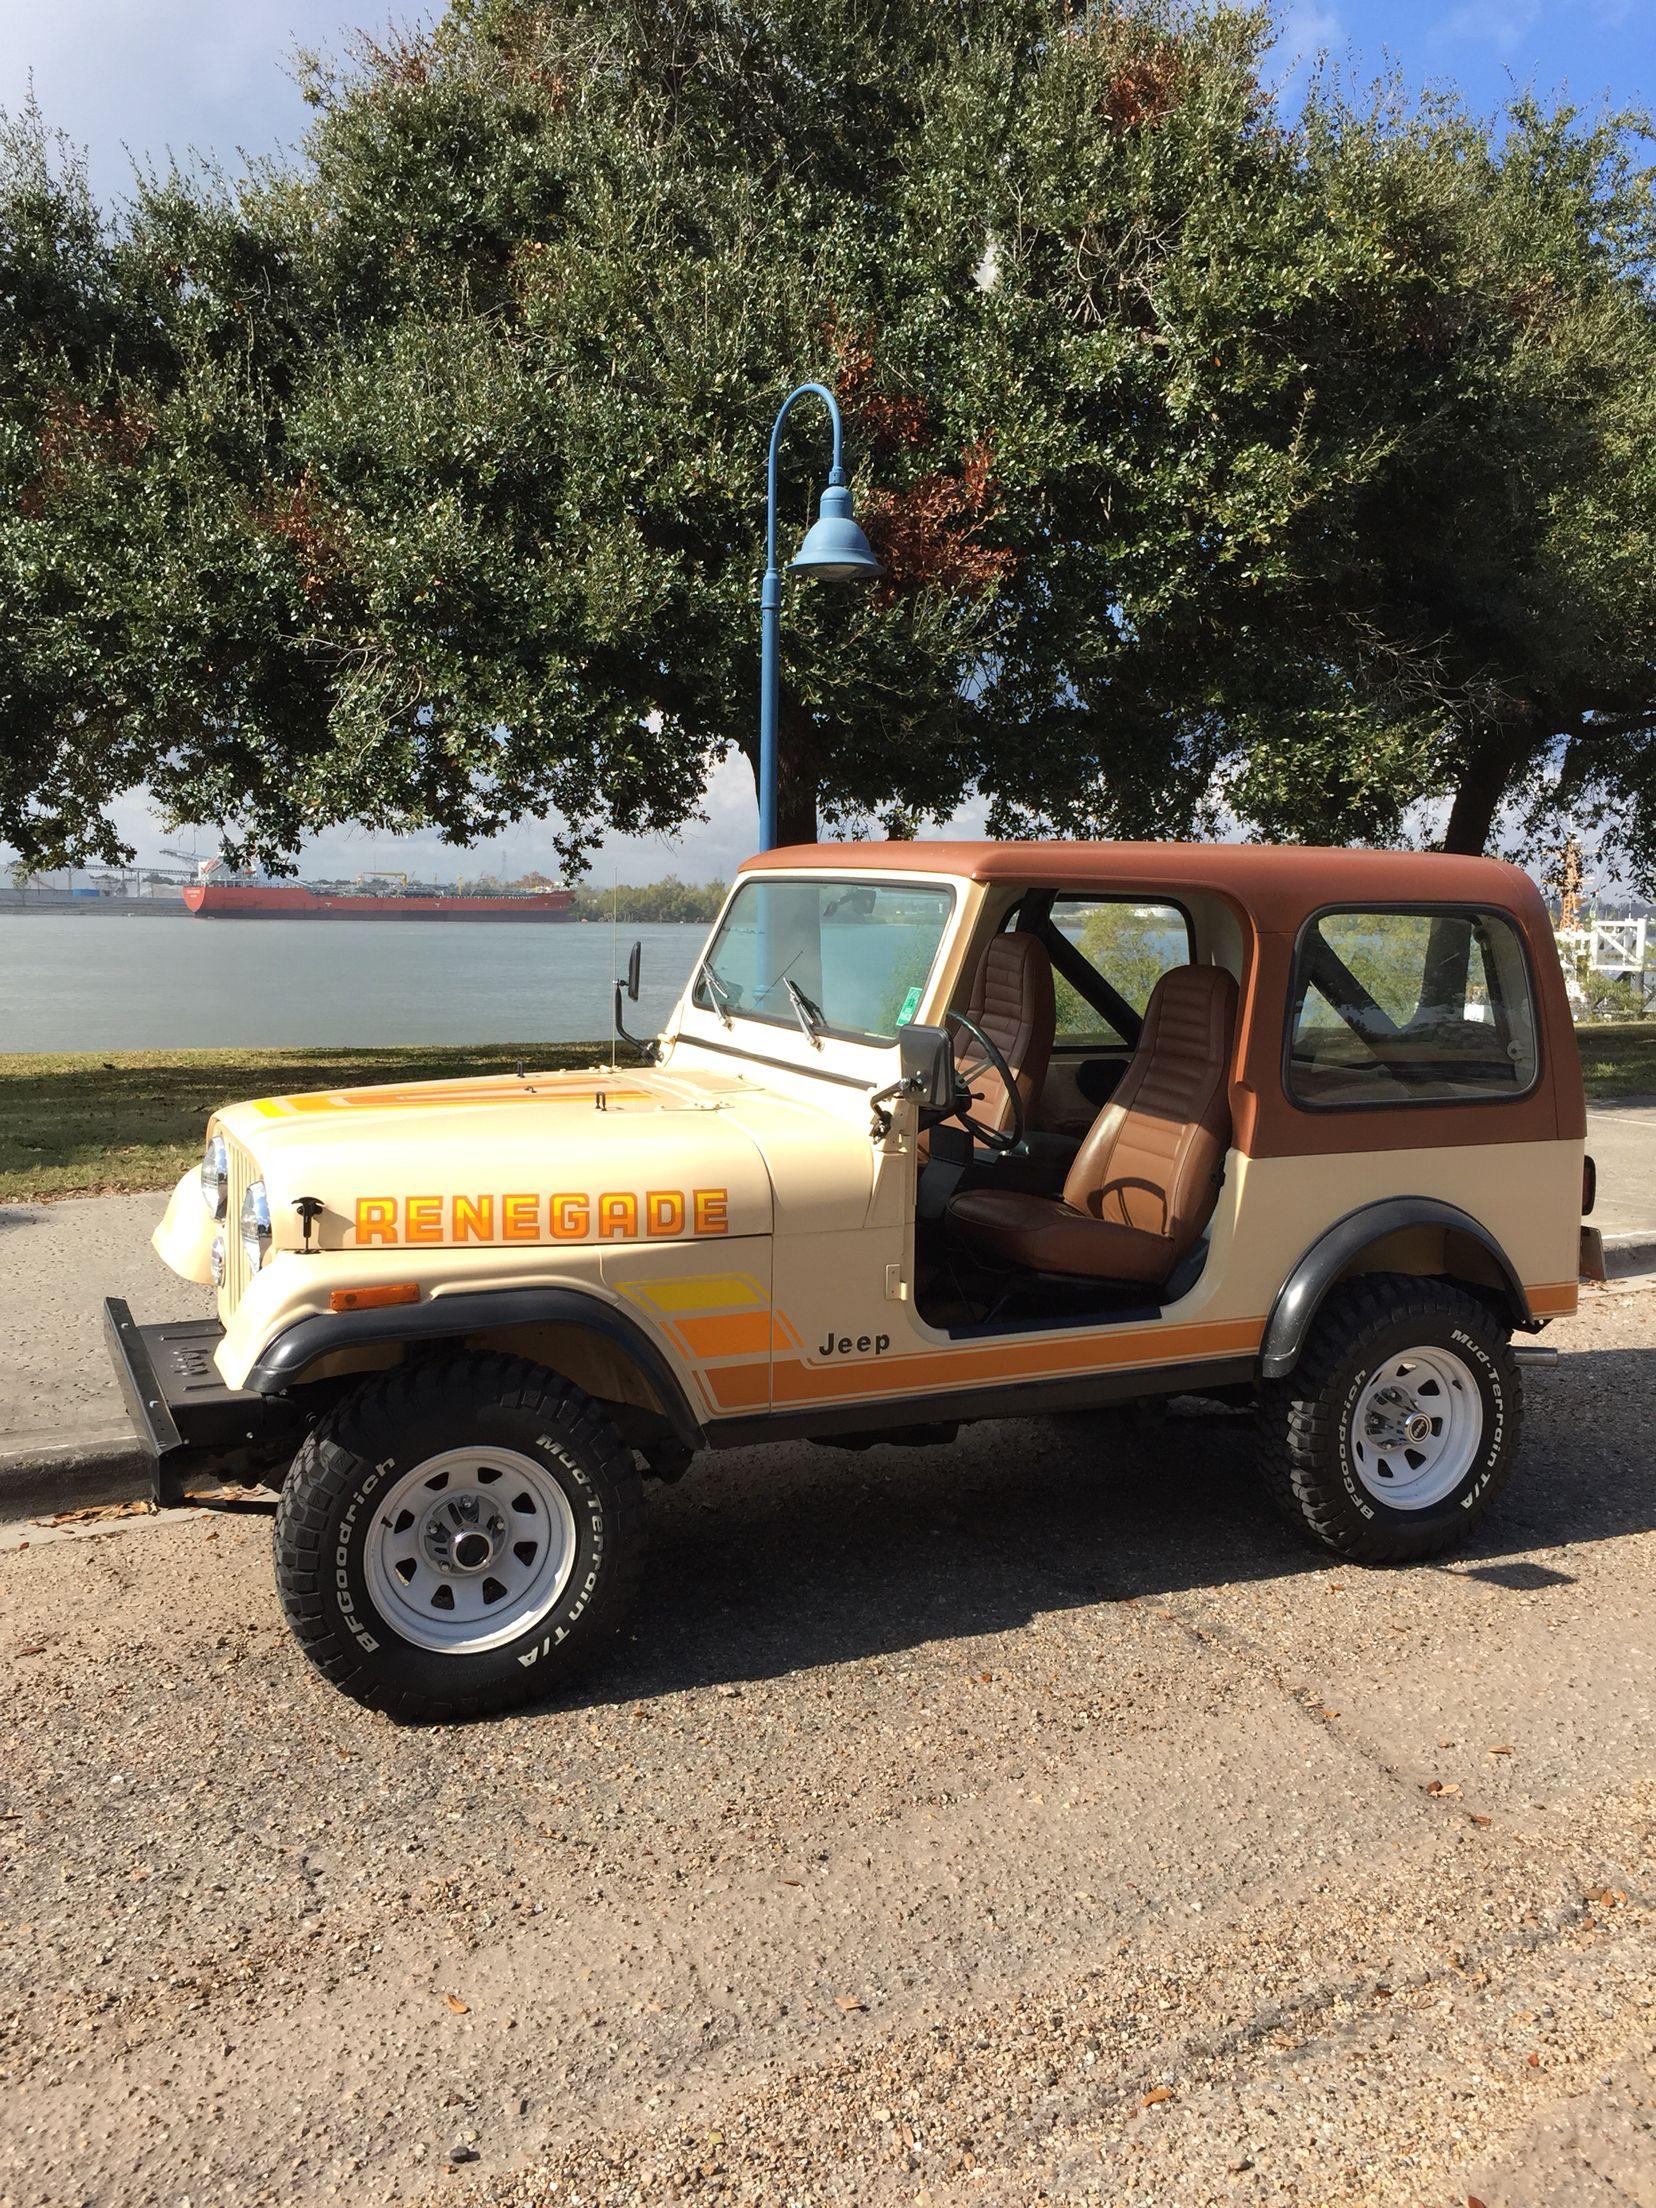 1982 Jeep Cj7 Renegade Jamaican Beige Jeep Cj7 Jeep Cj Jeep